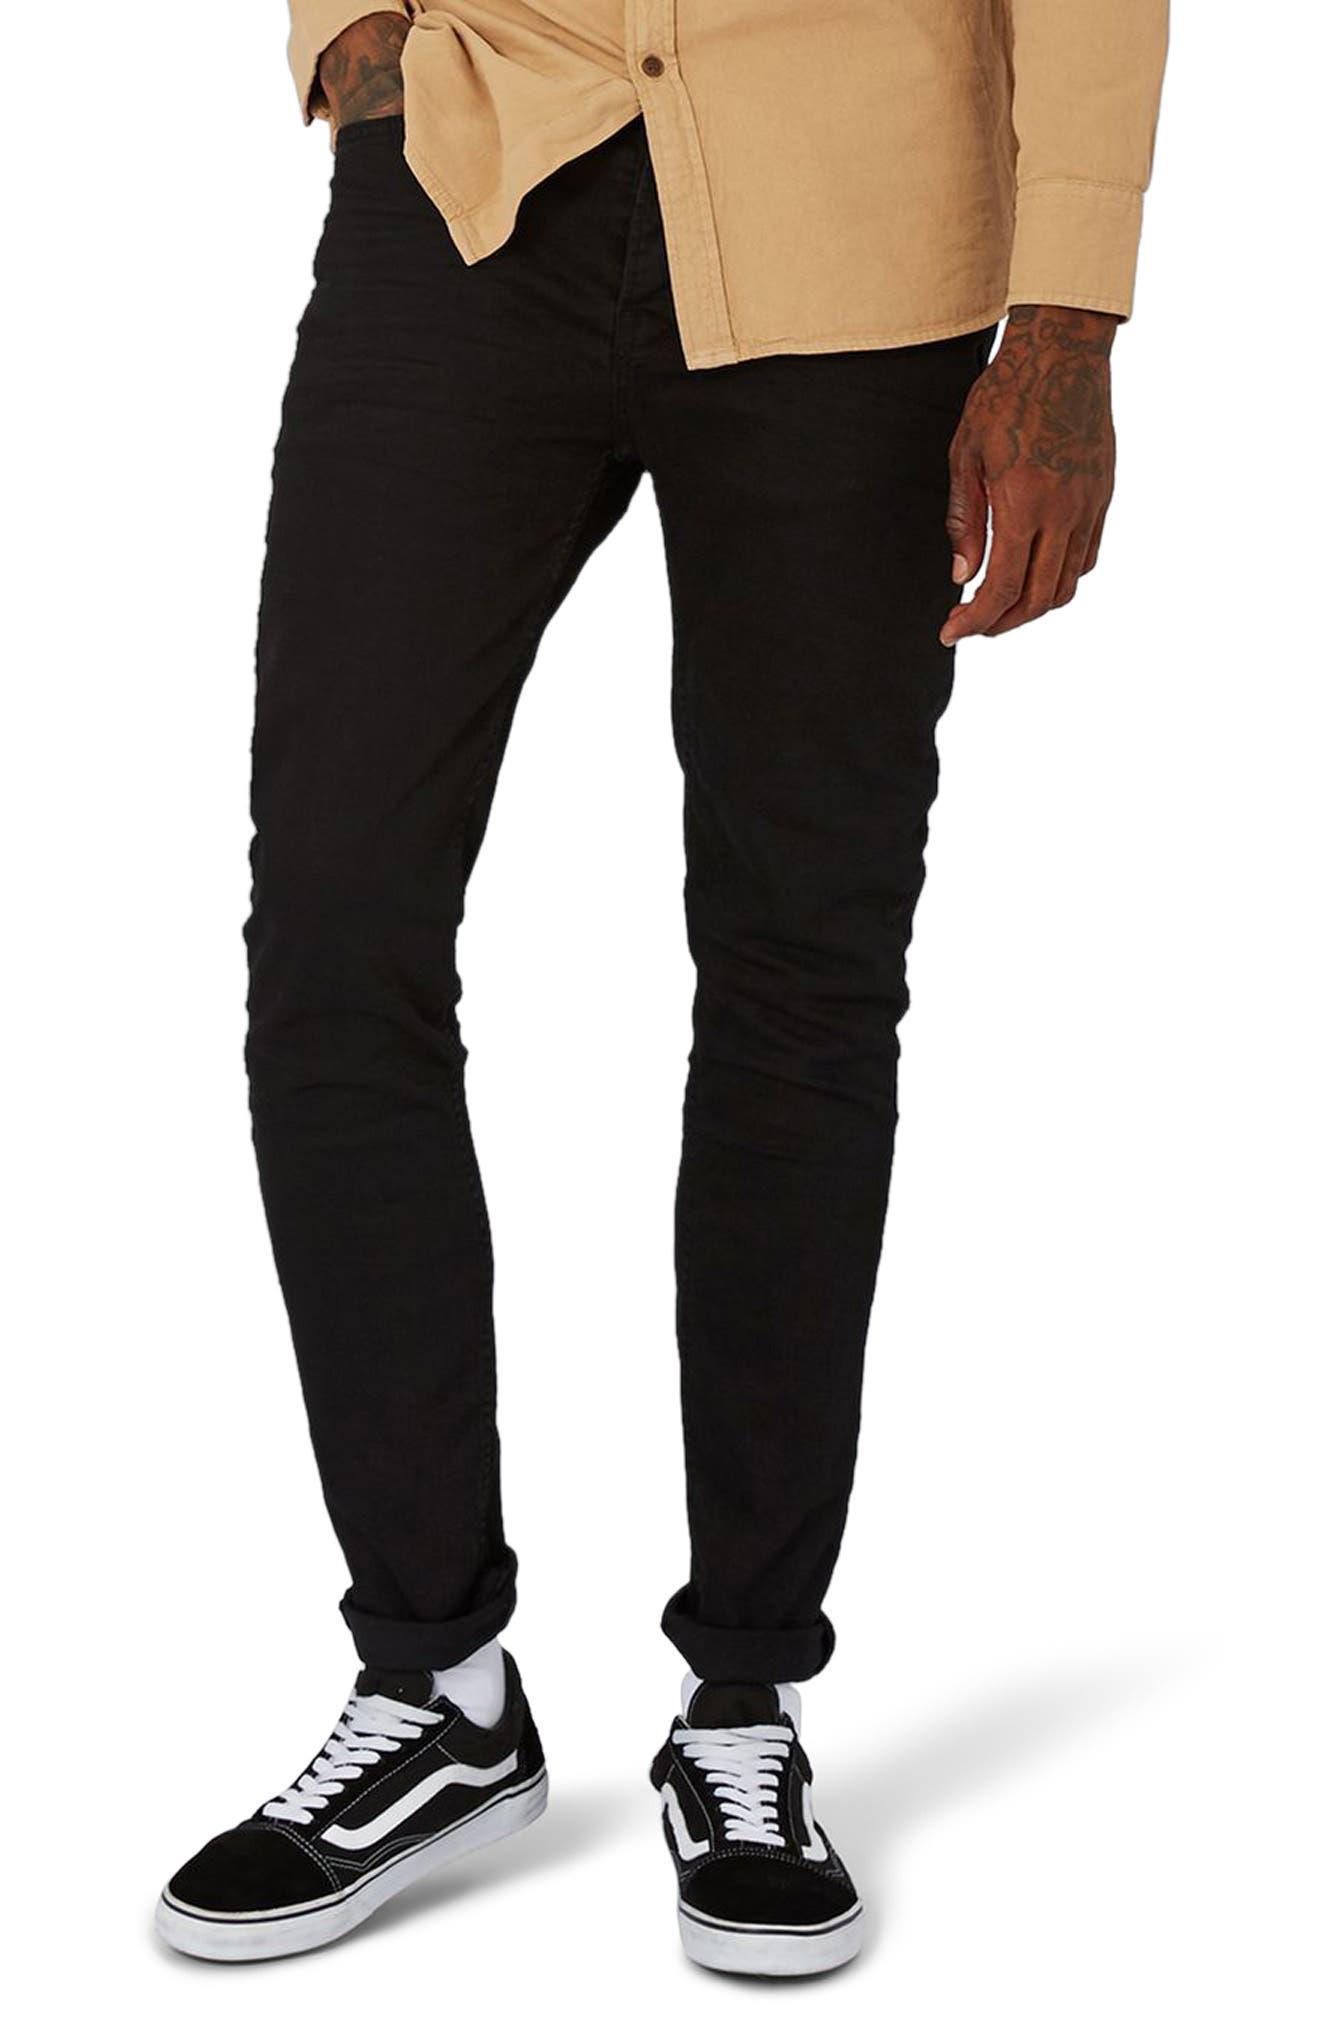 Topman Overdyed Stretch Skinny Jeans